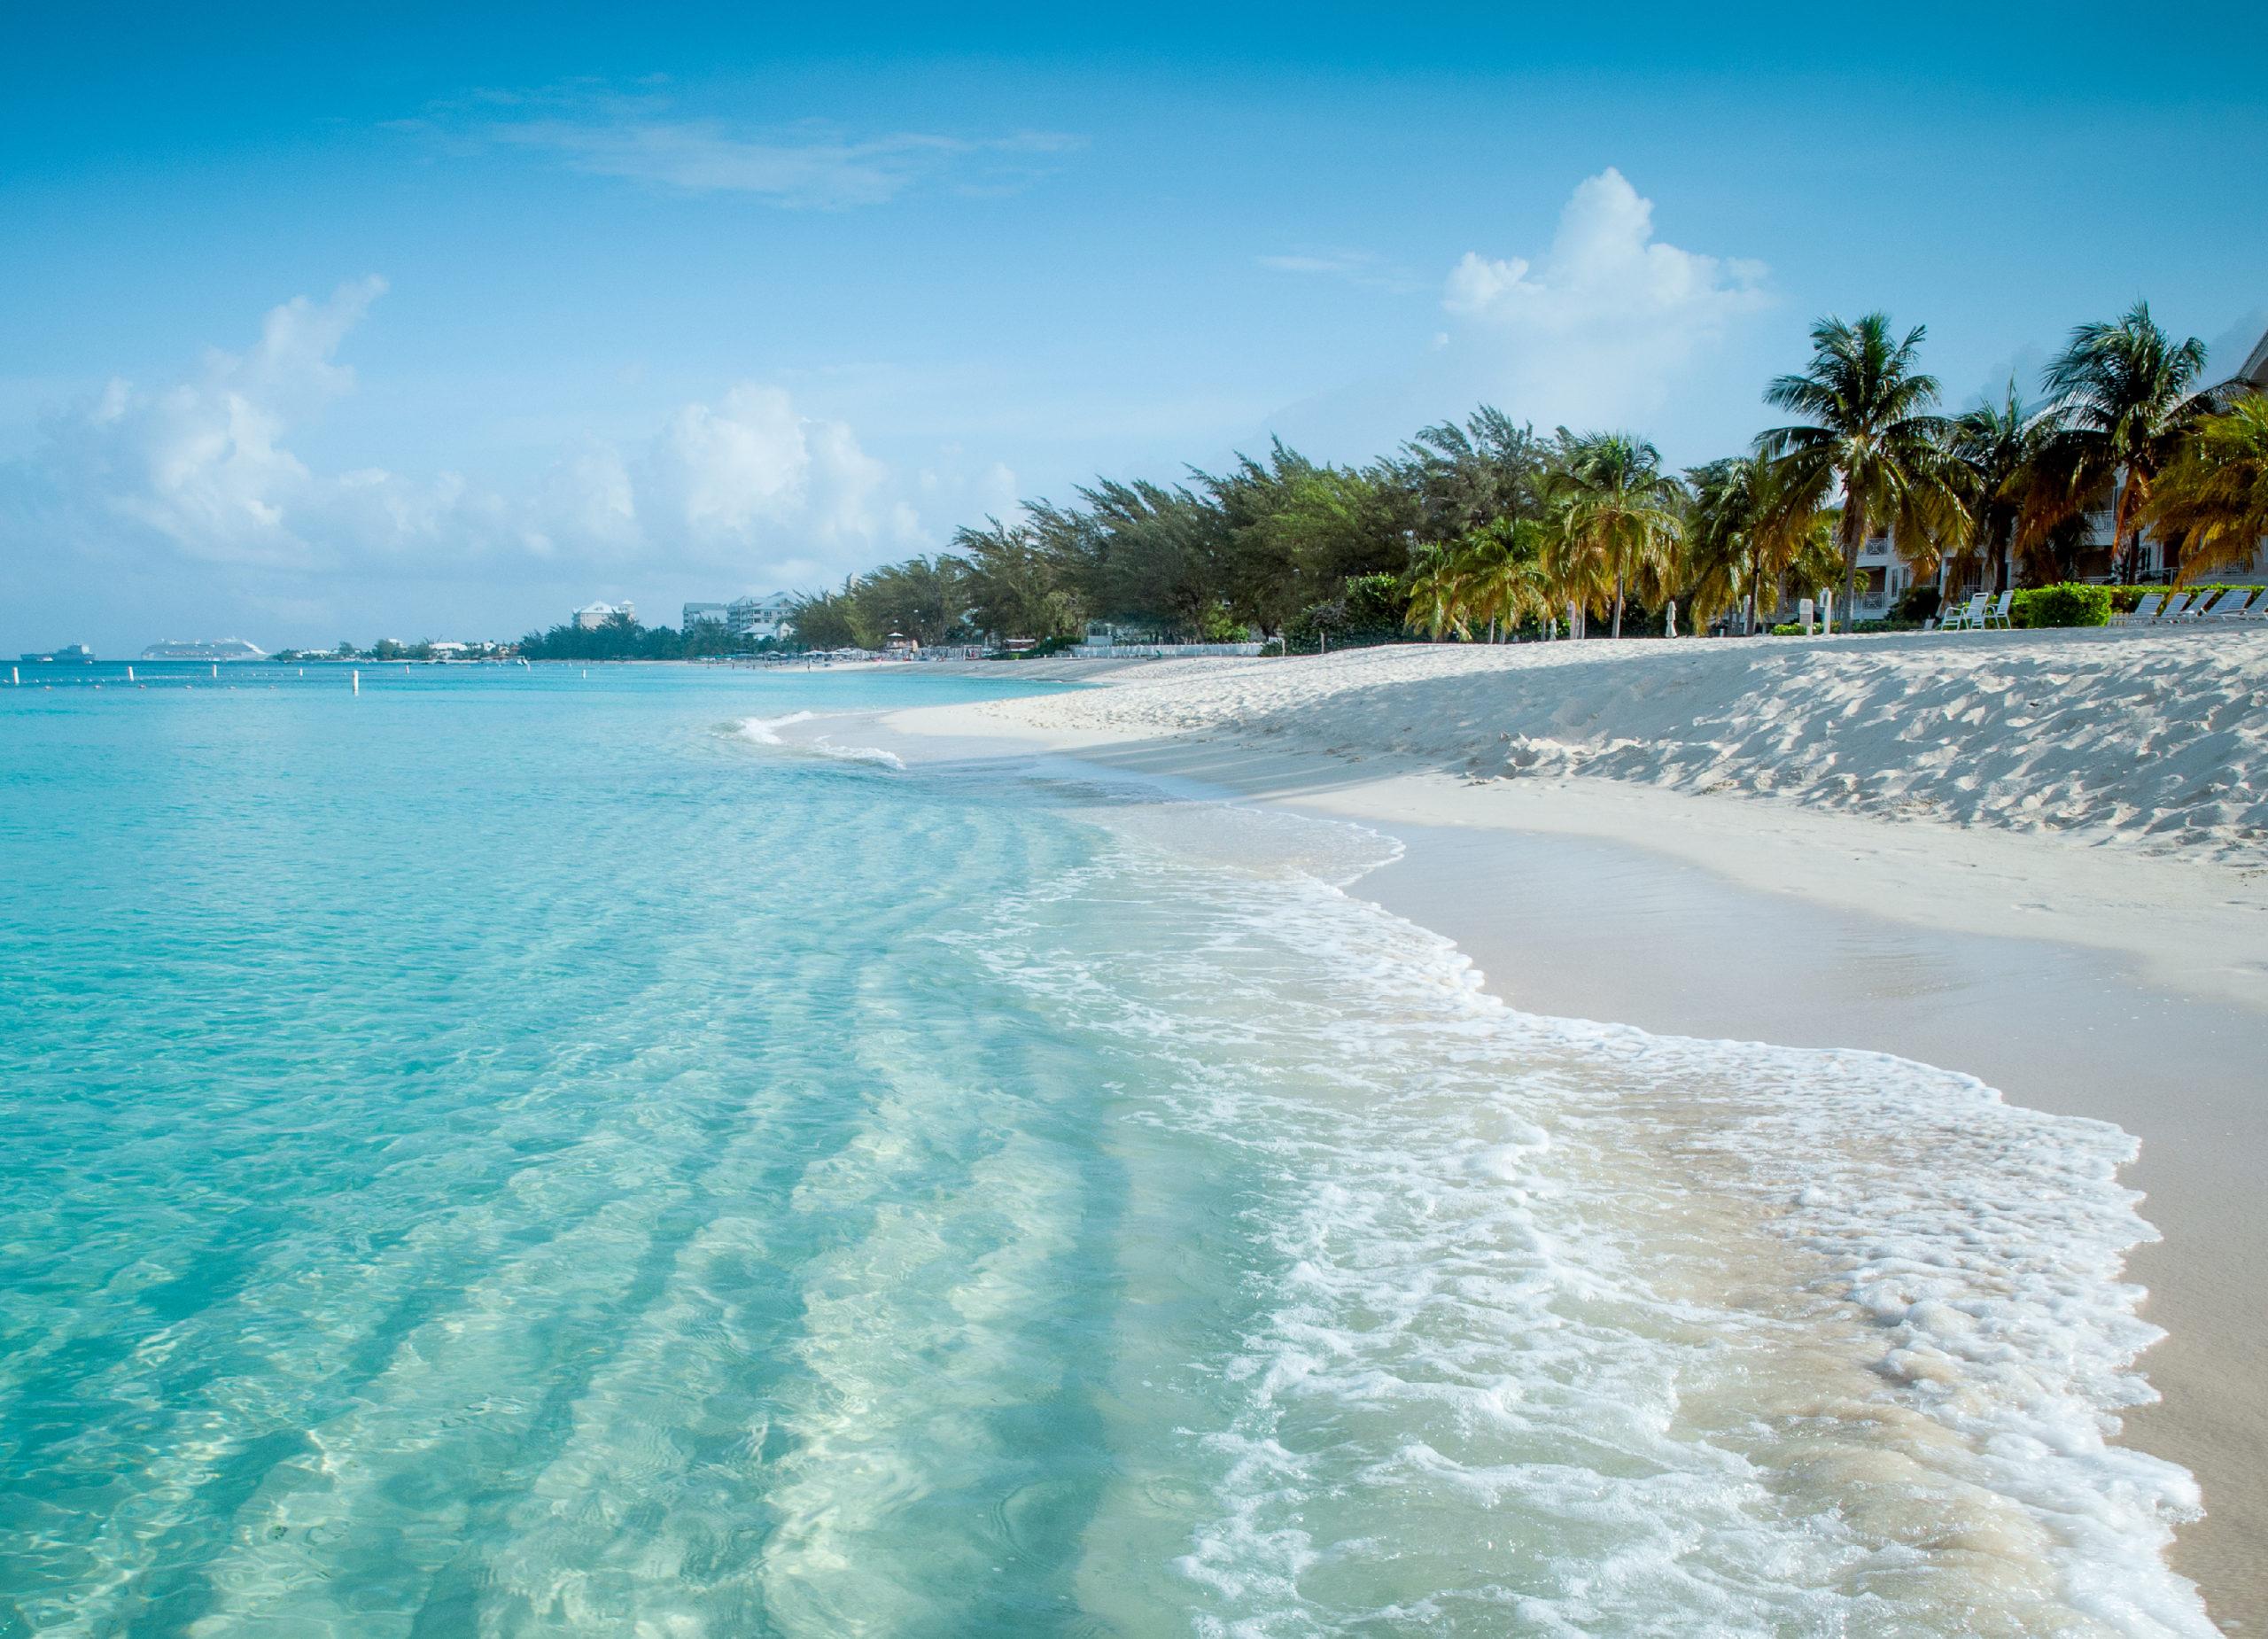 Photo of a Cayman Islands beach shore.